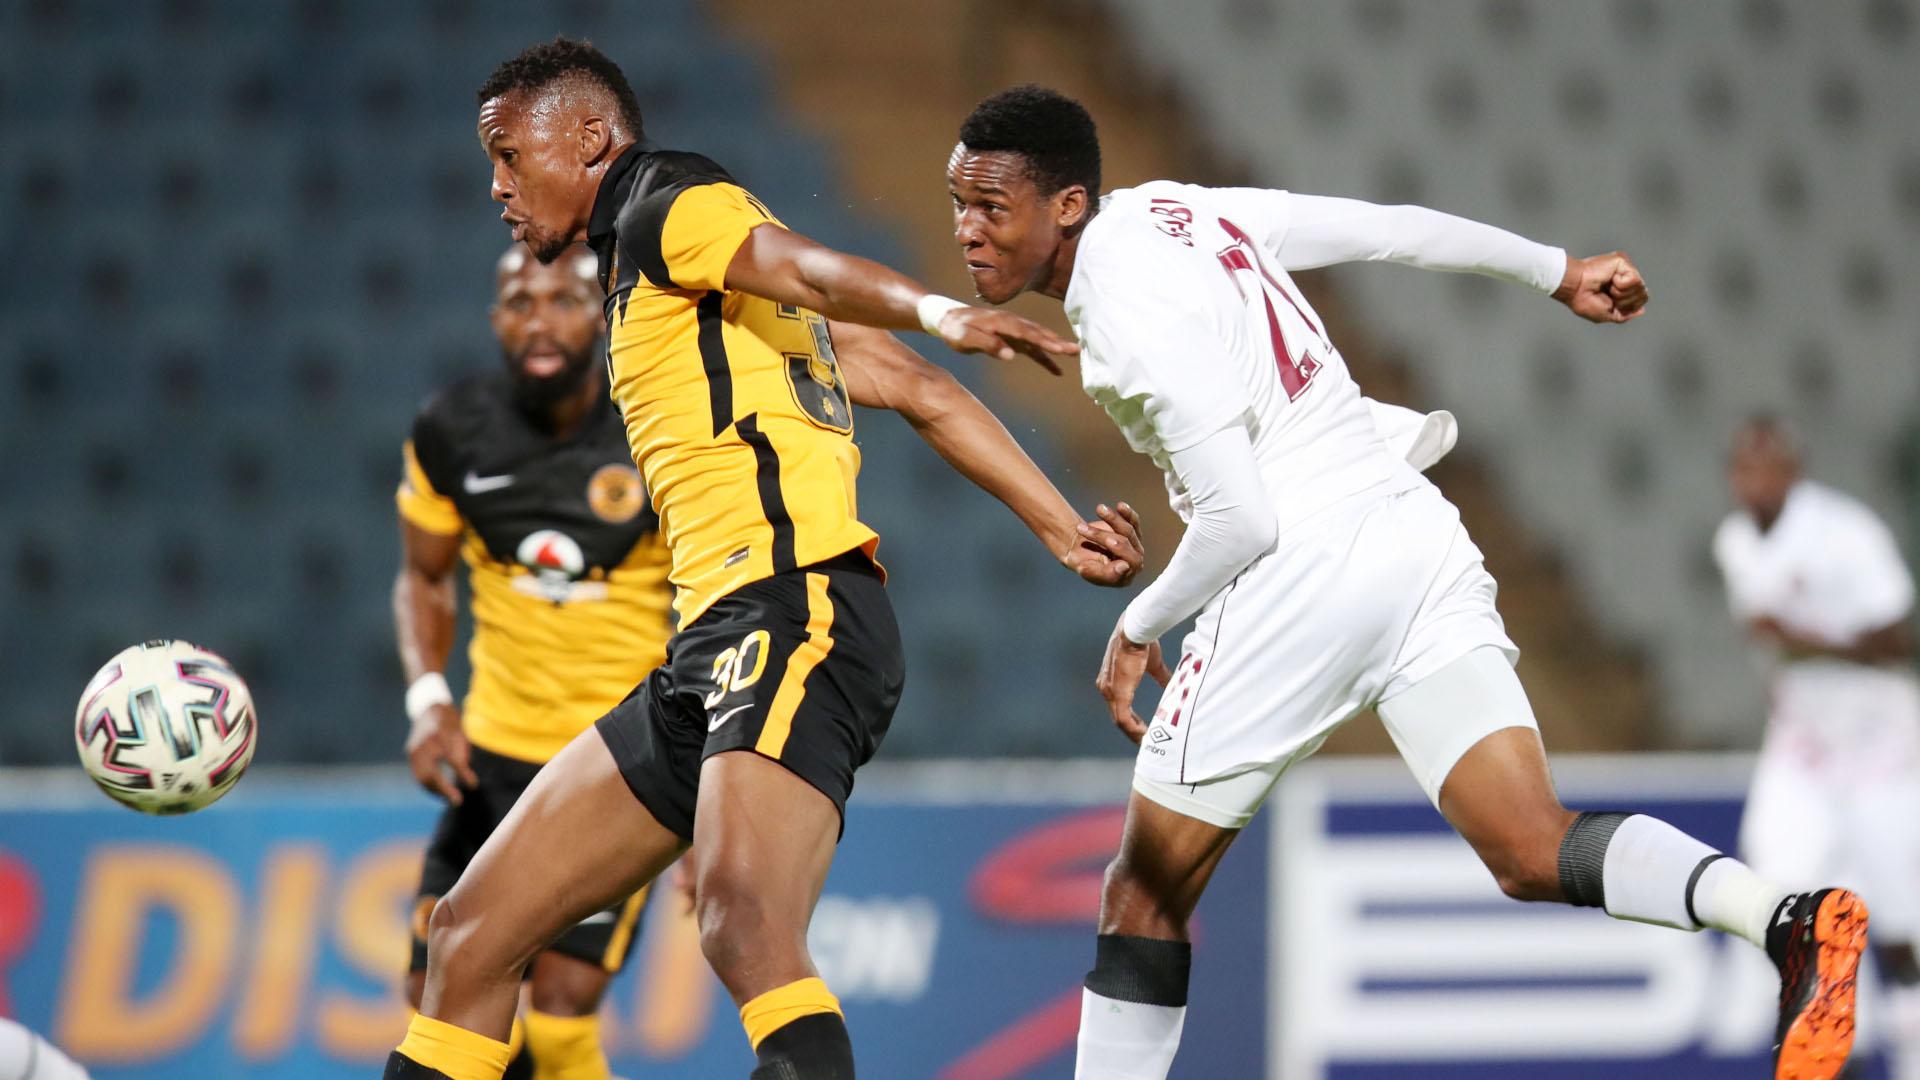 DStv Premiership | Swallows v Chiefs l Highlights